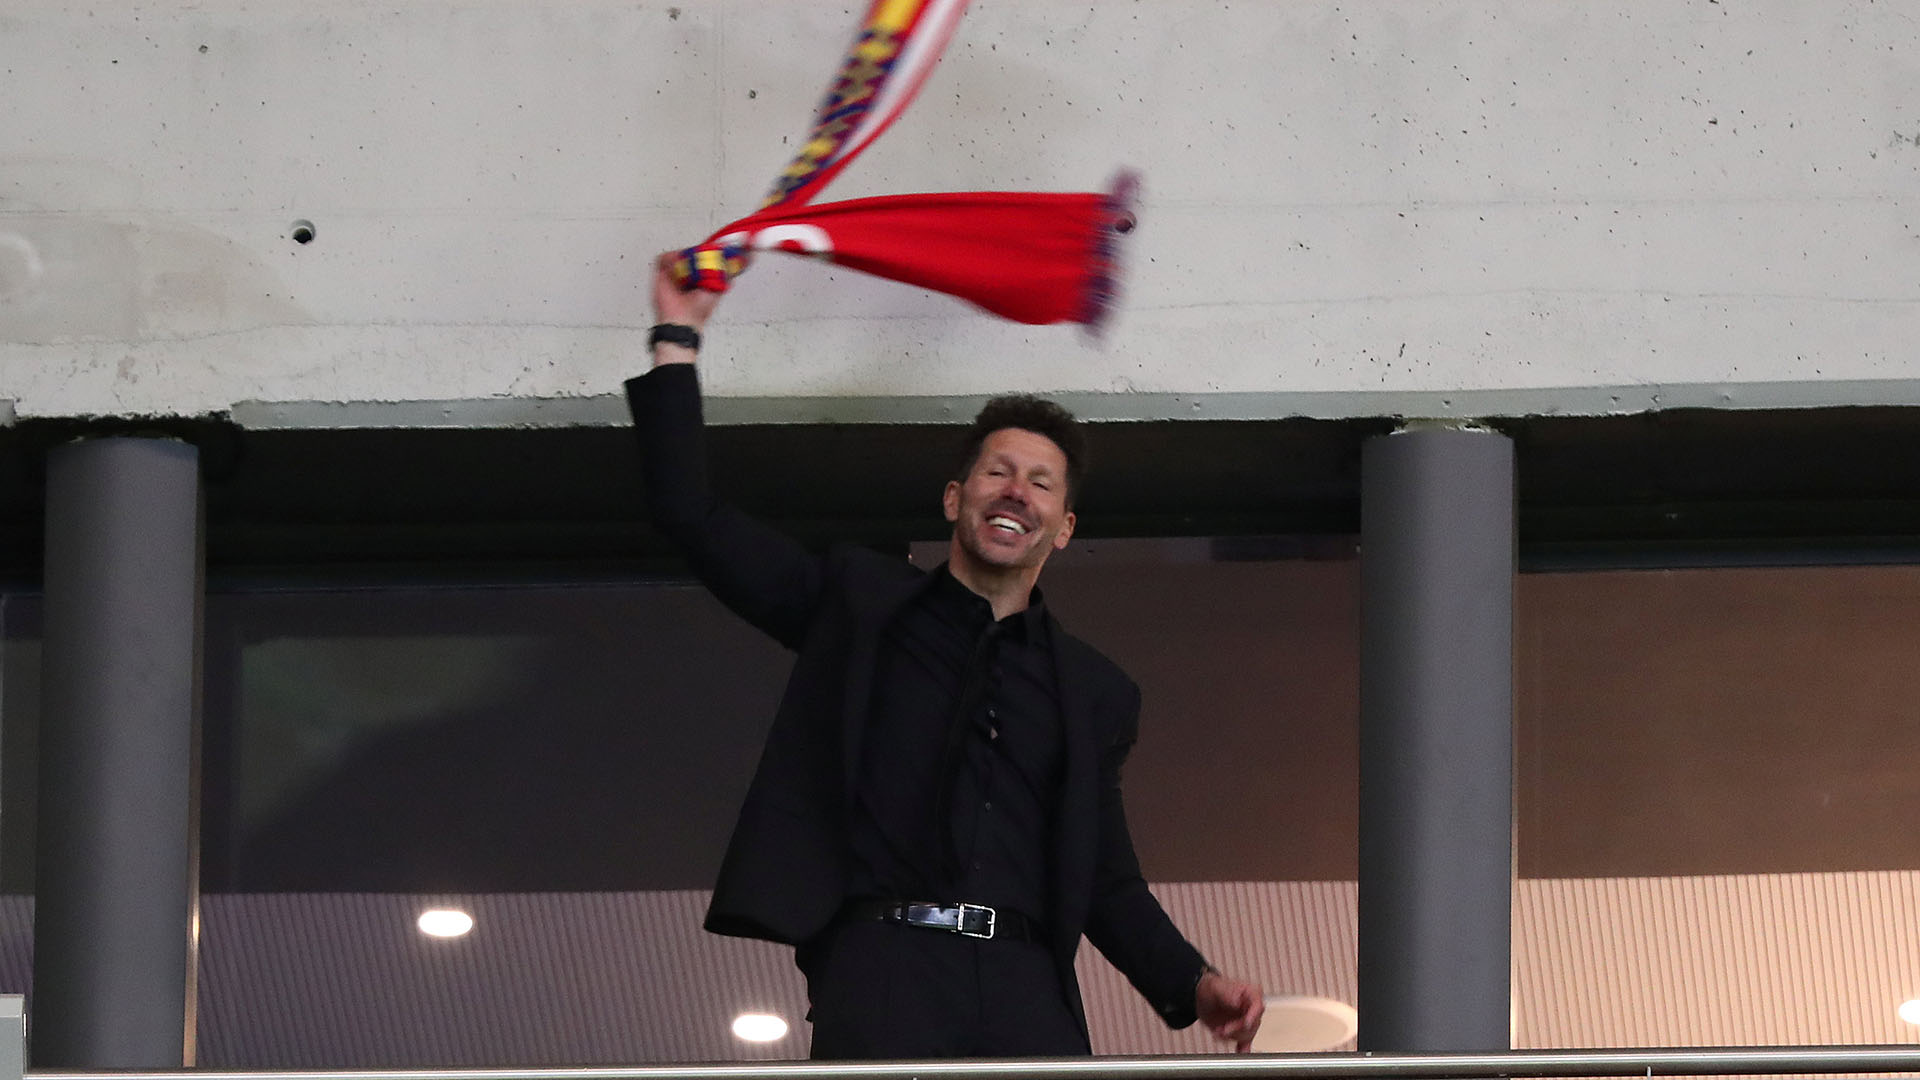 Así celebró el pasaje a la final de la actual Europa League (Foto: Reuters)